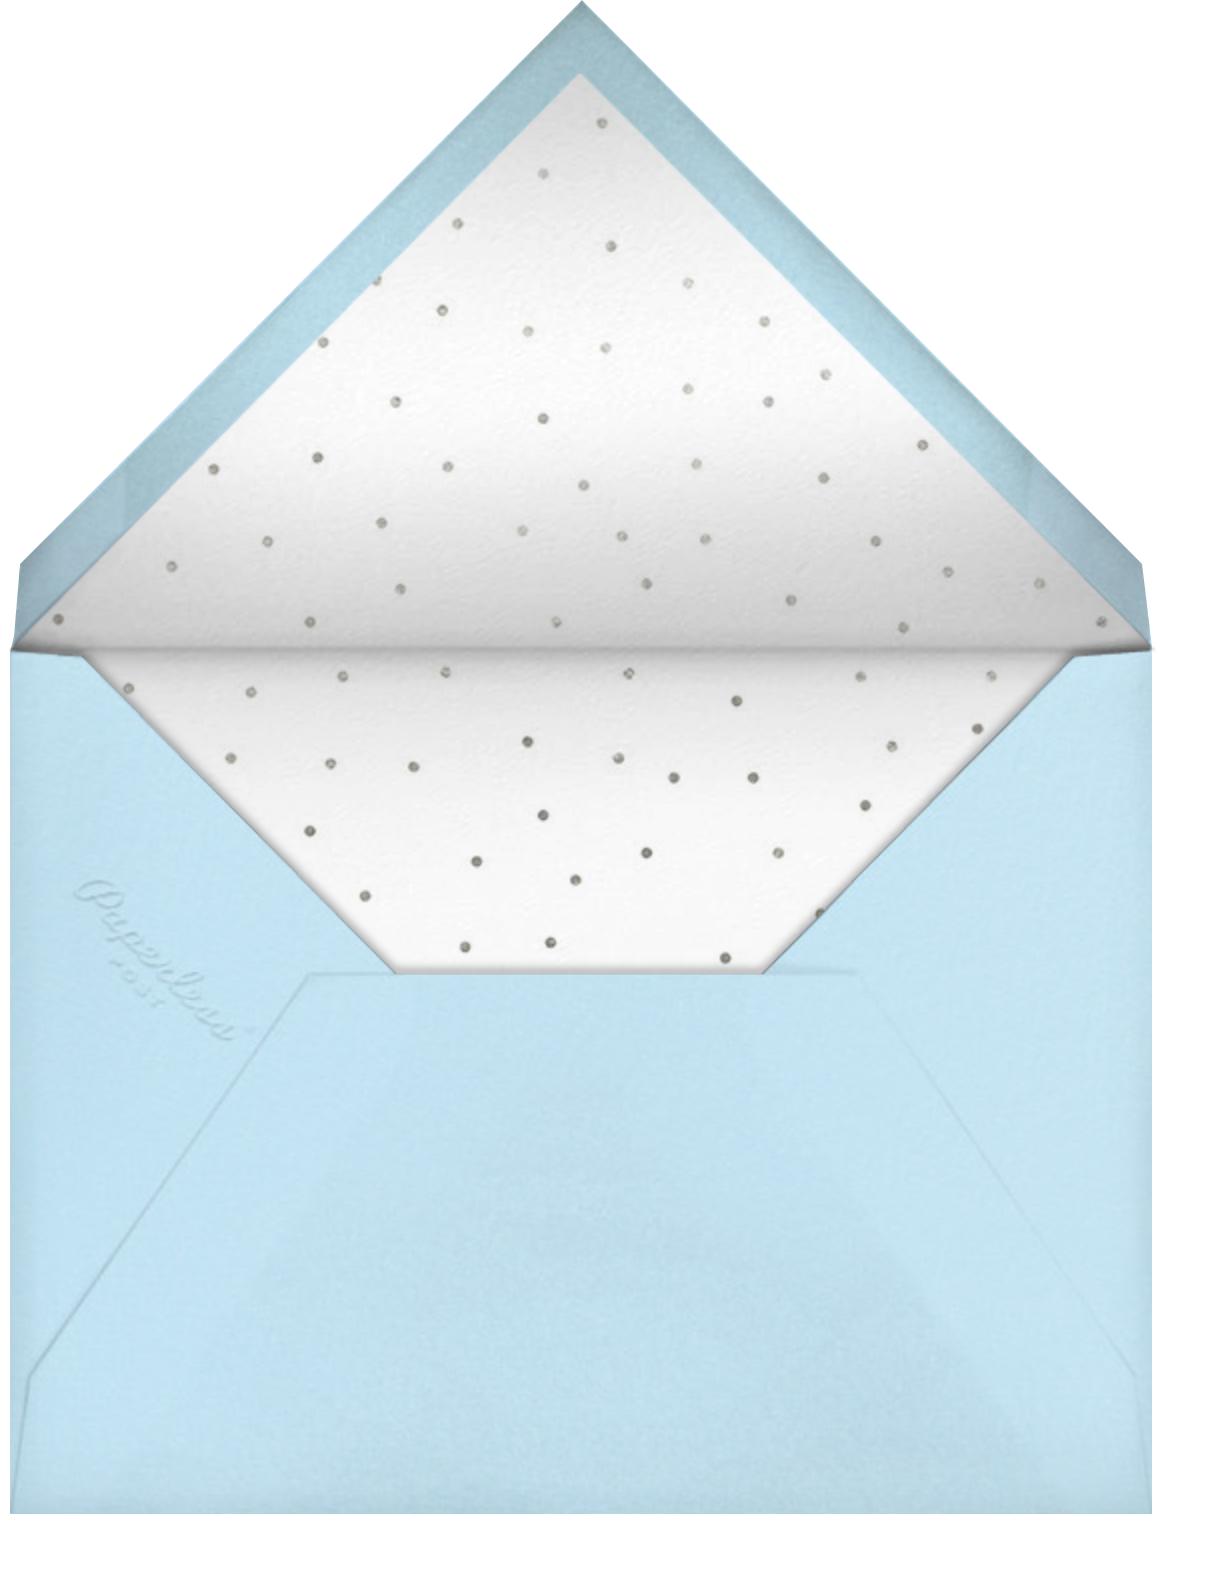 Snow Glow - Silver - Paperless Post - Kids' birthday - envelope back